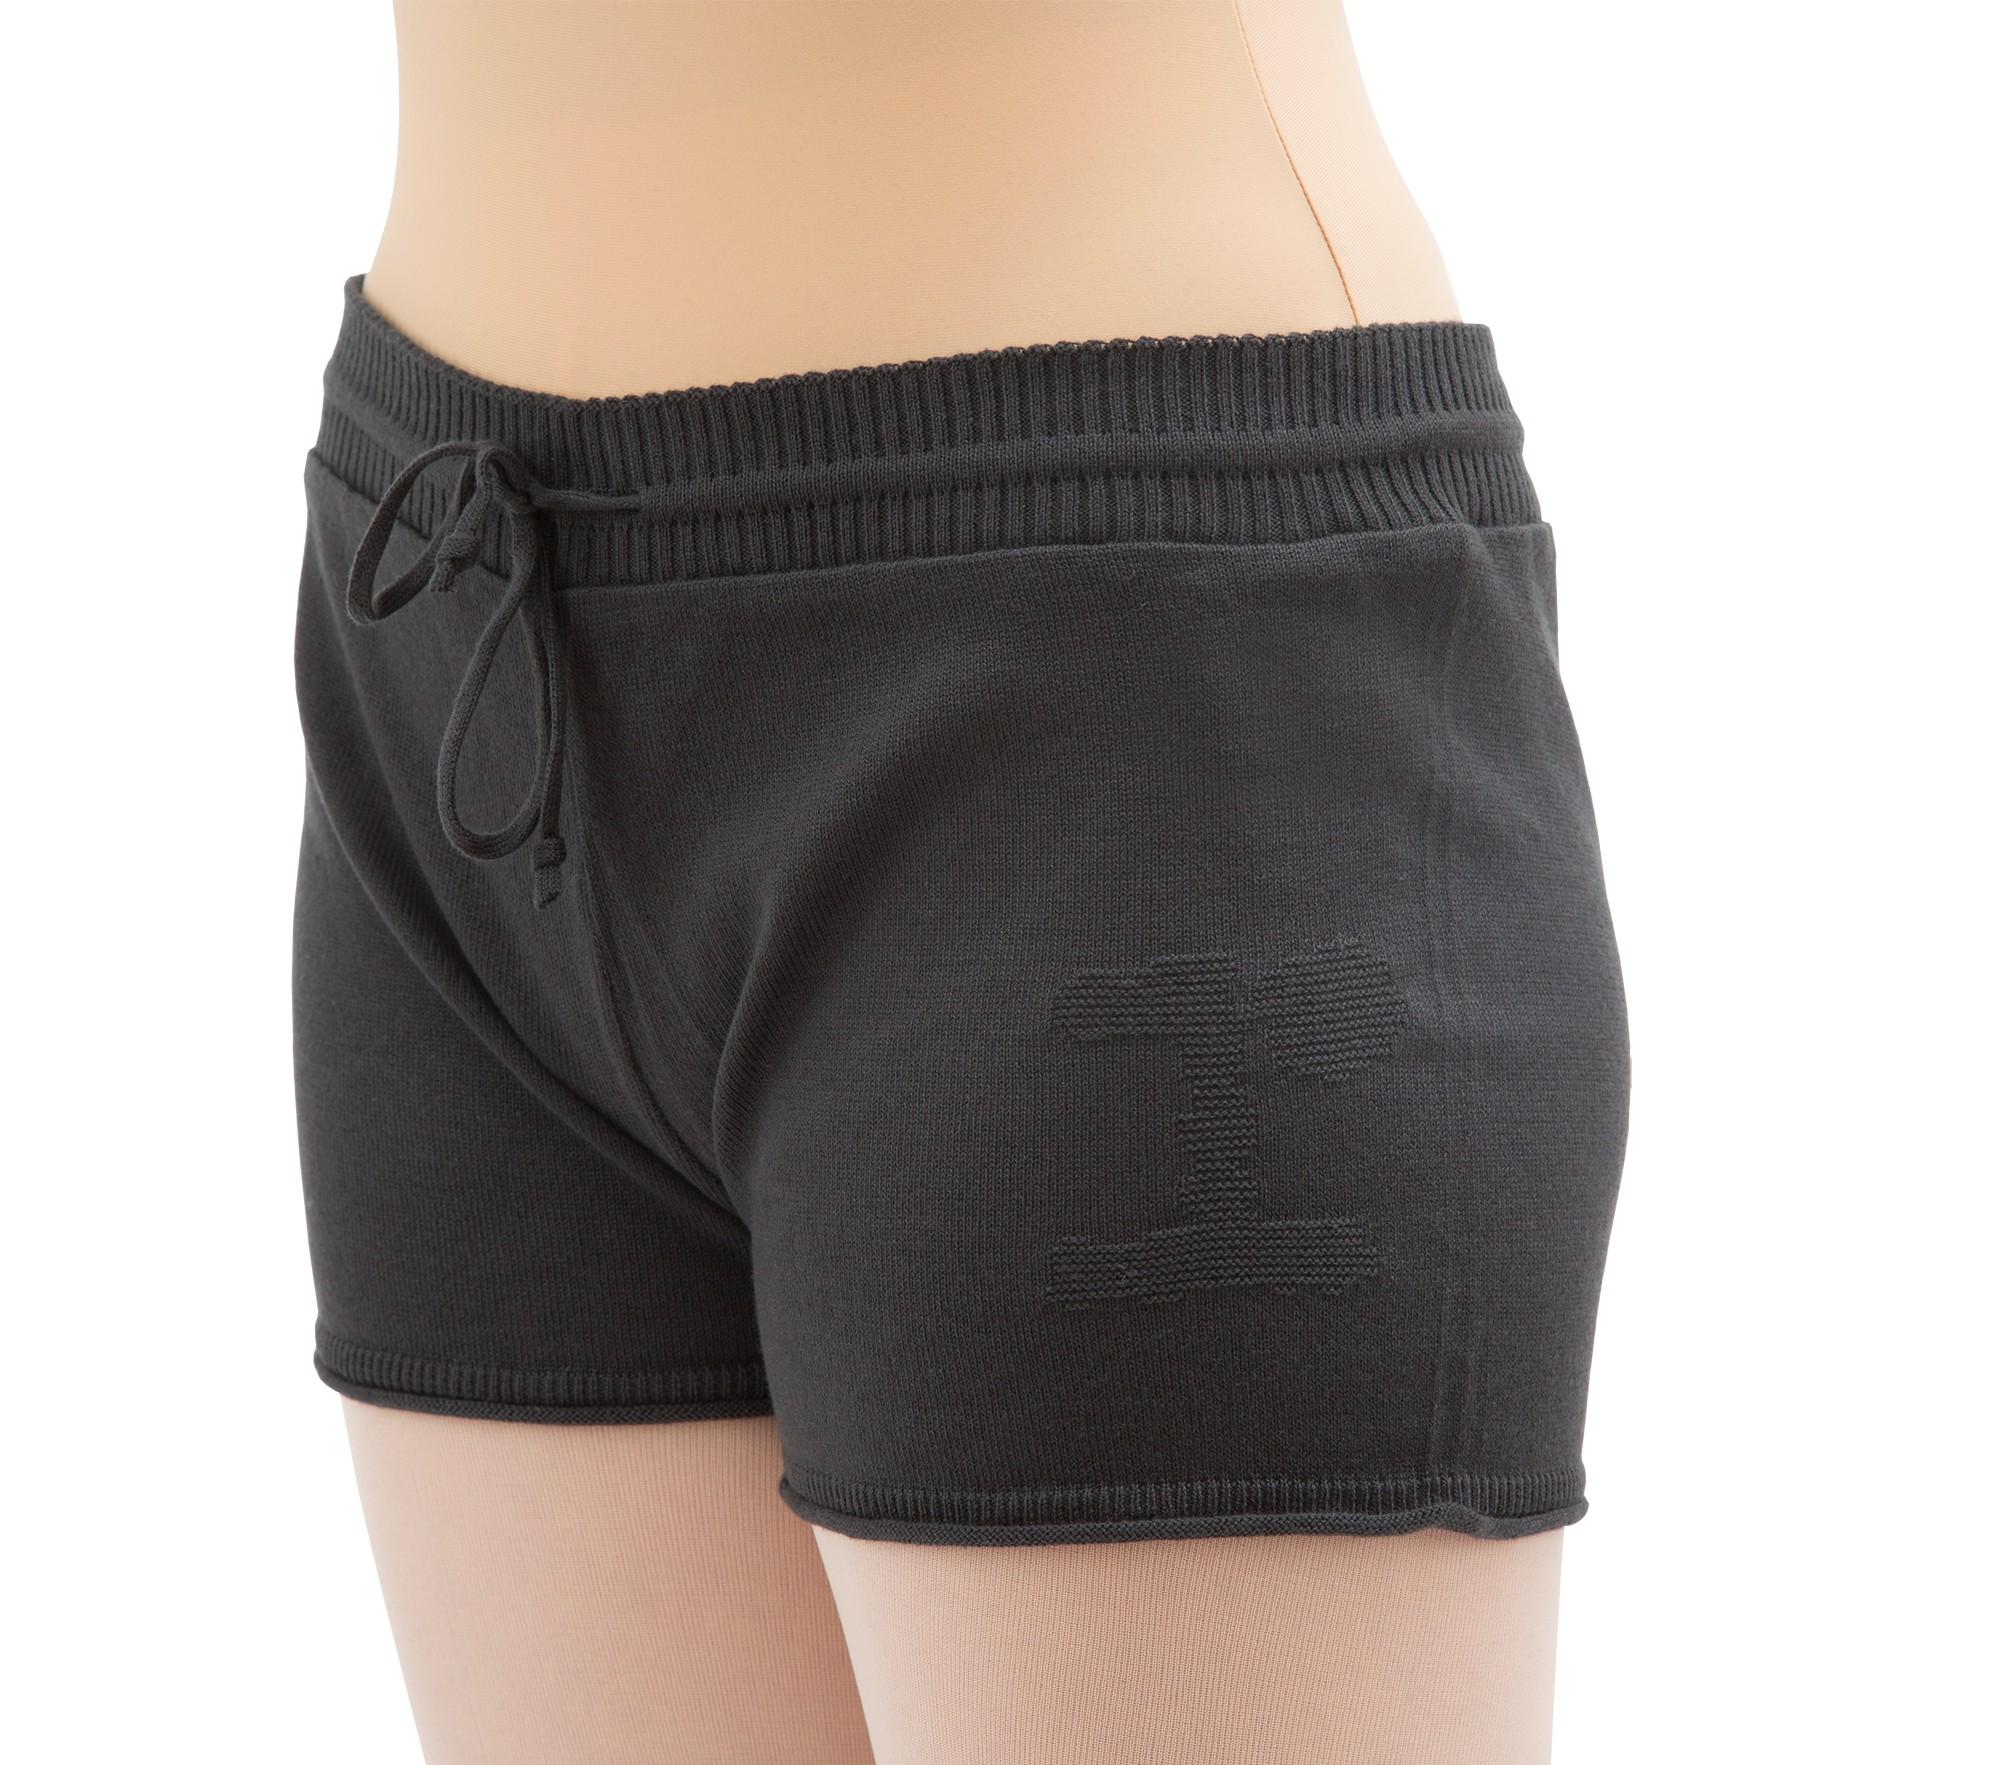 Warm up shorts